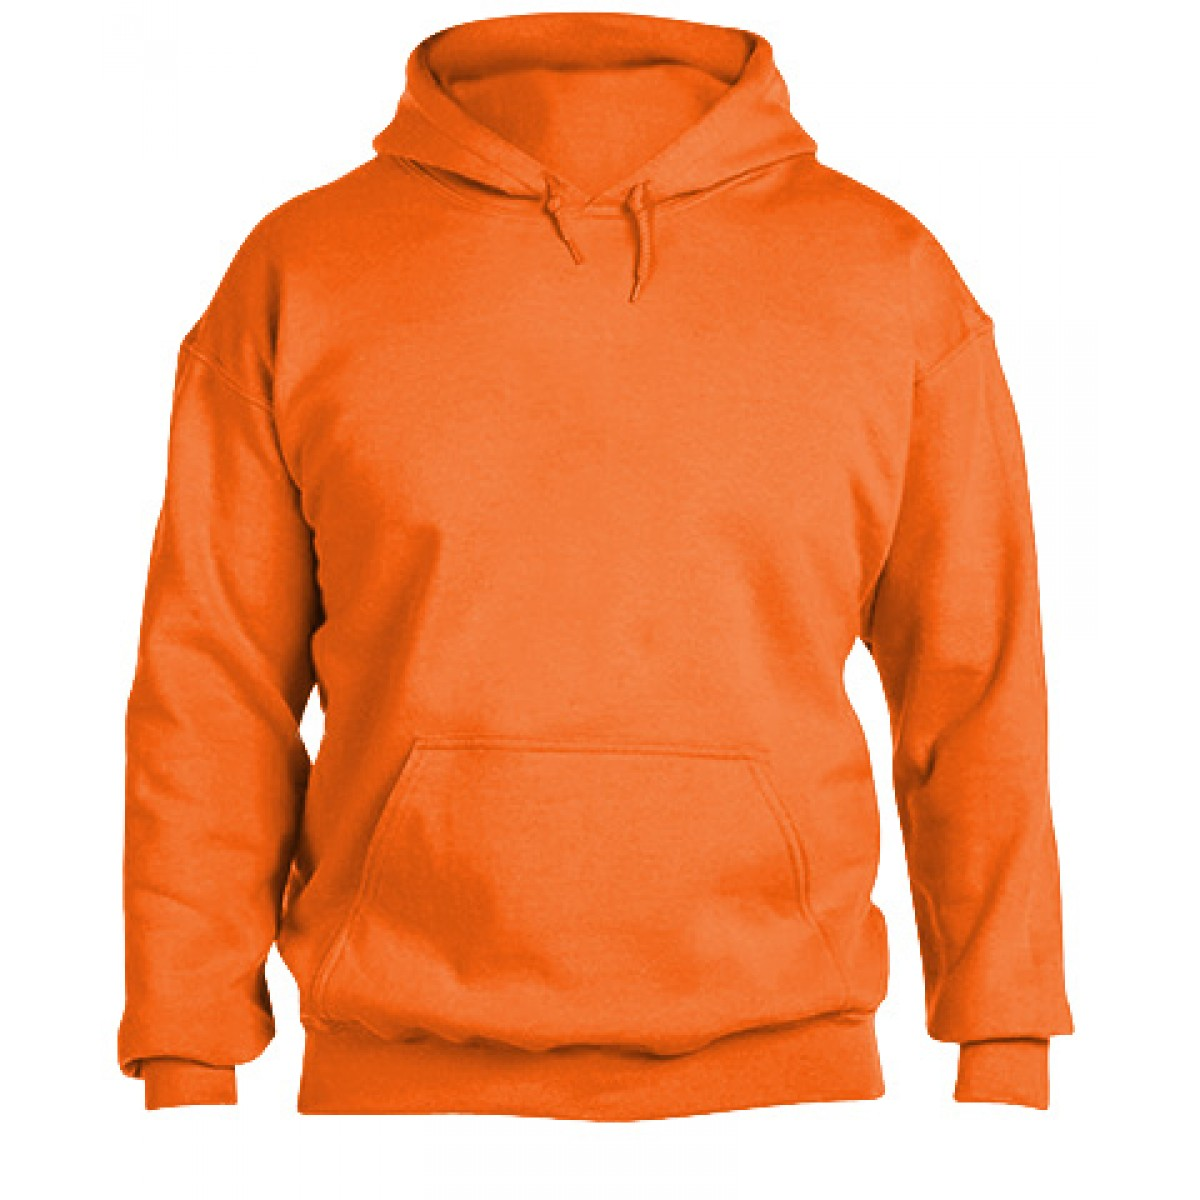 Solid Hooded Sweatshirt  50/50 Heavy Blend-Safety Orange-YL